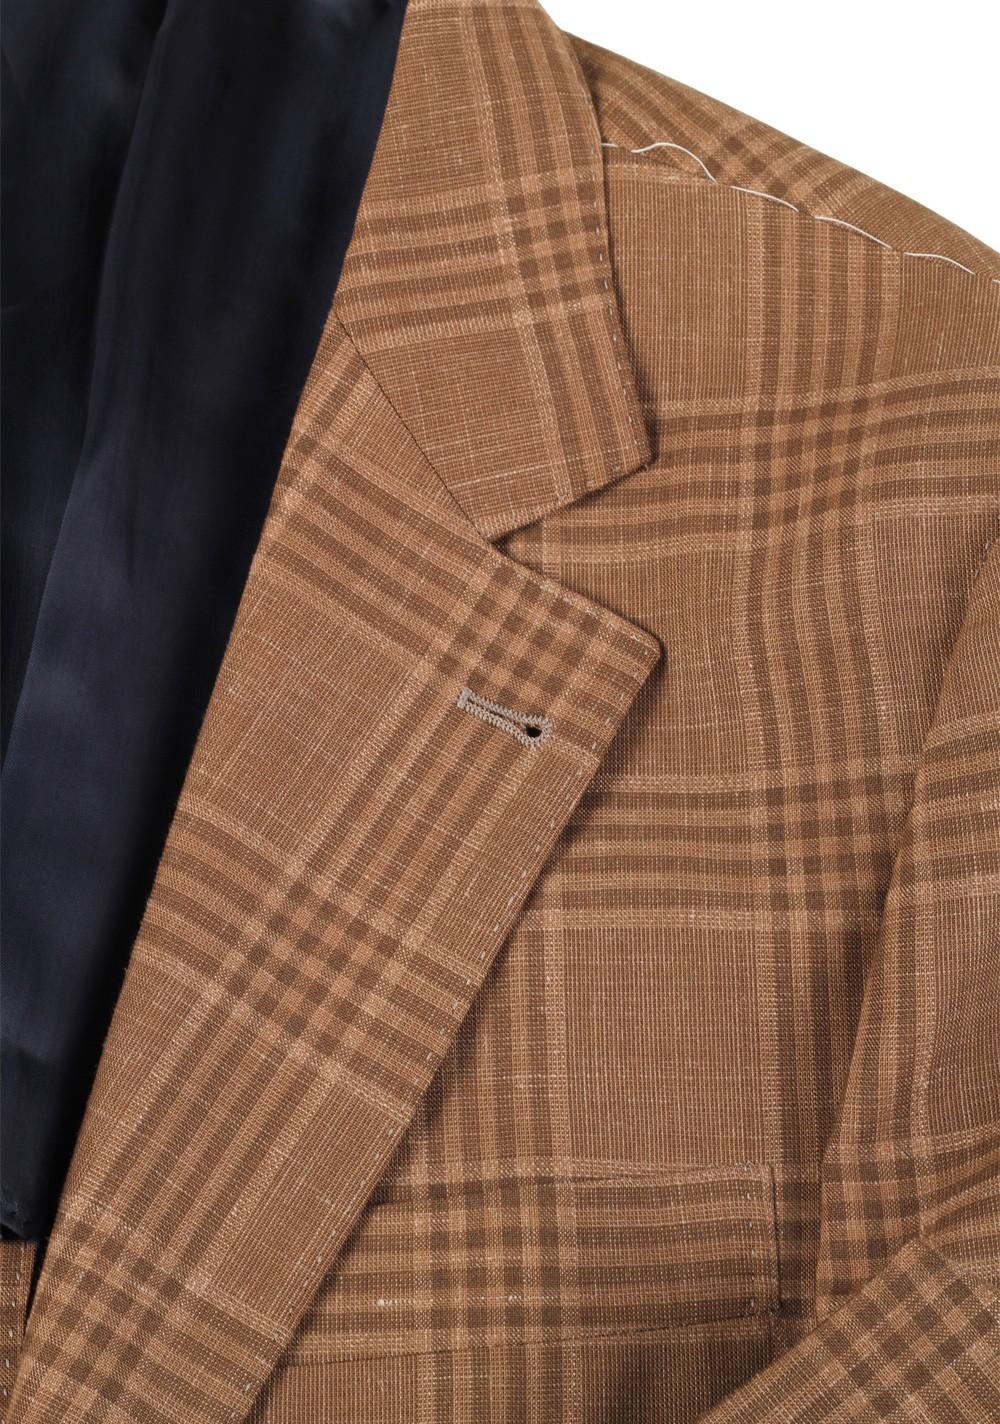 Cucinelli Beige Sport Coat Size 52 / 42R U.S. Wool Linen | Costume Limité